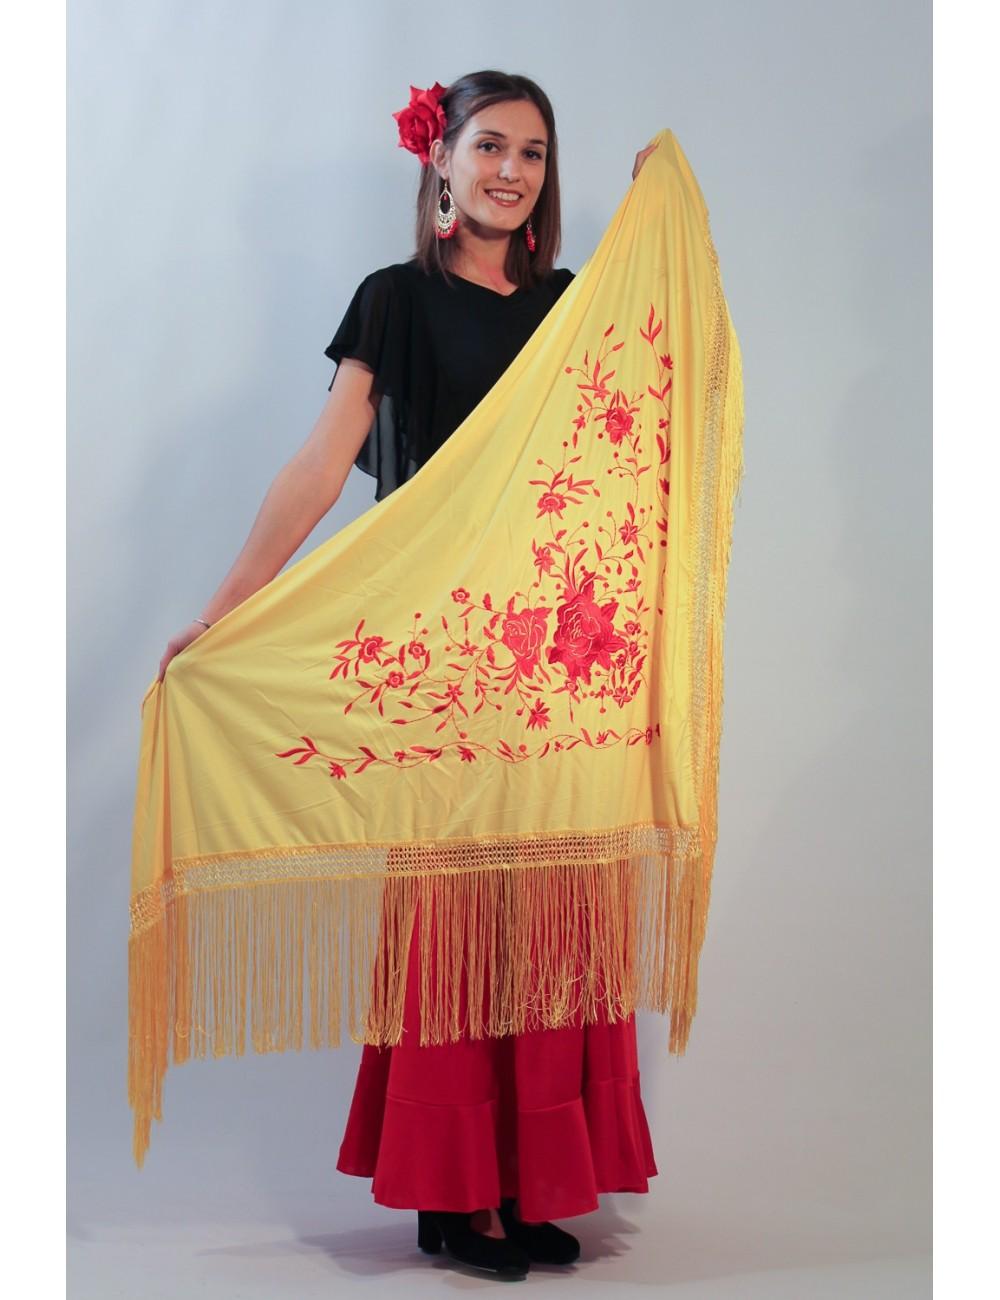 Châle de flamenco jaune brodé rouge